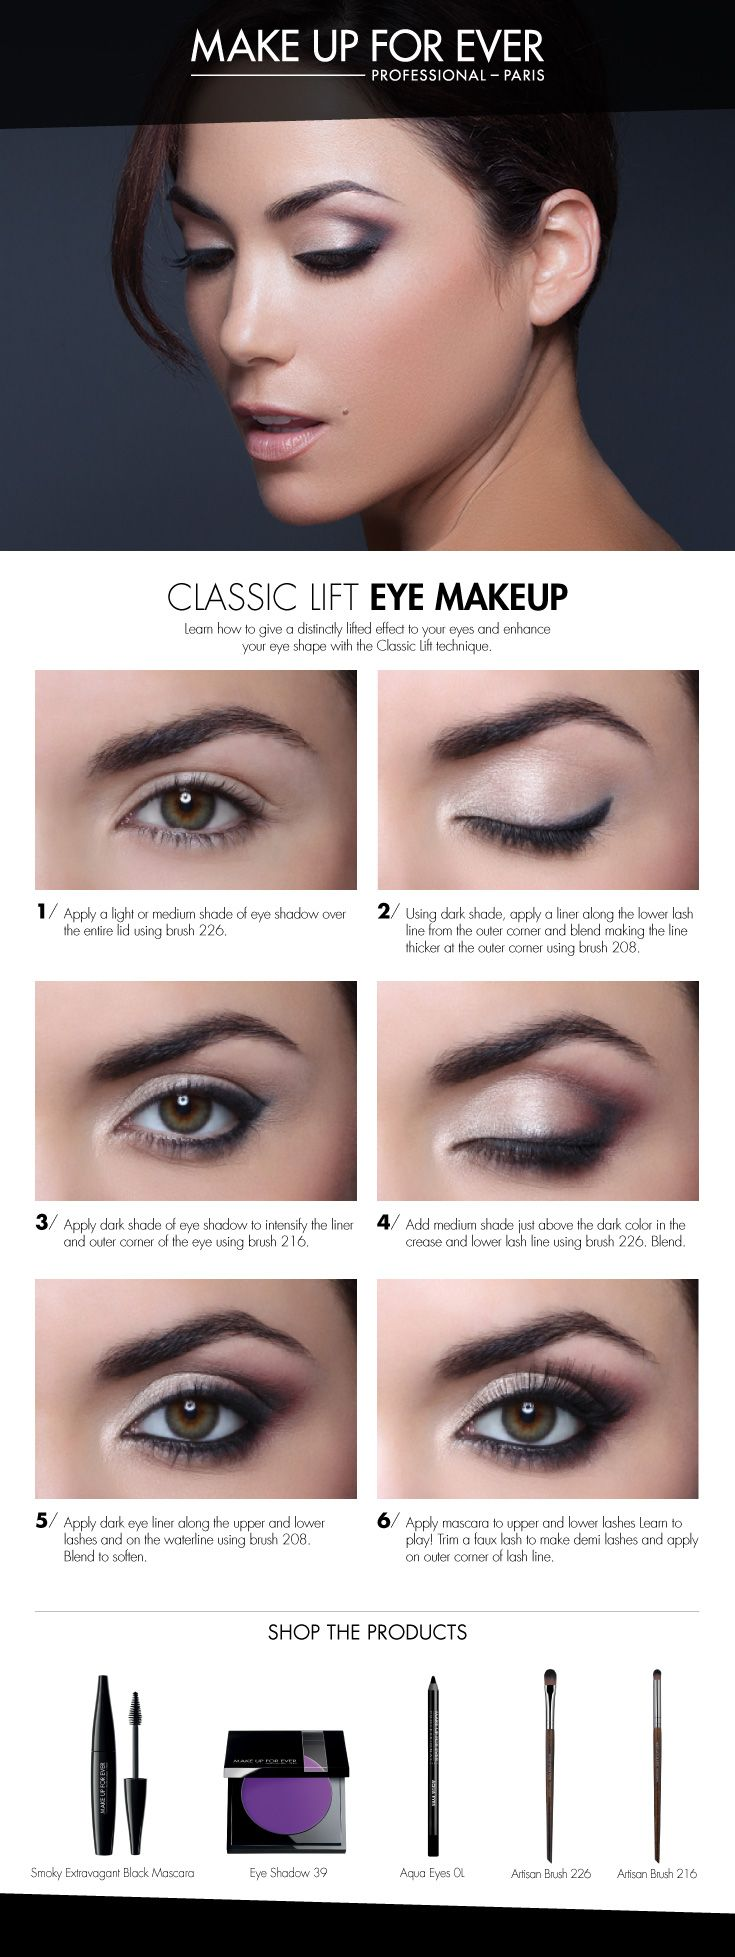 Makeup Tips For Small Round Eyes Jidimakeup